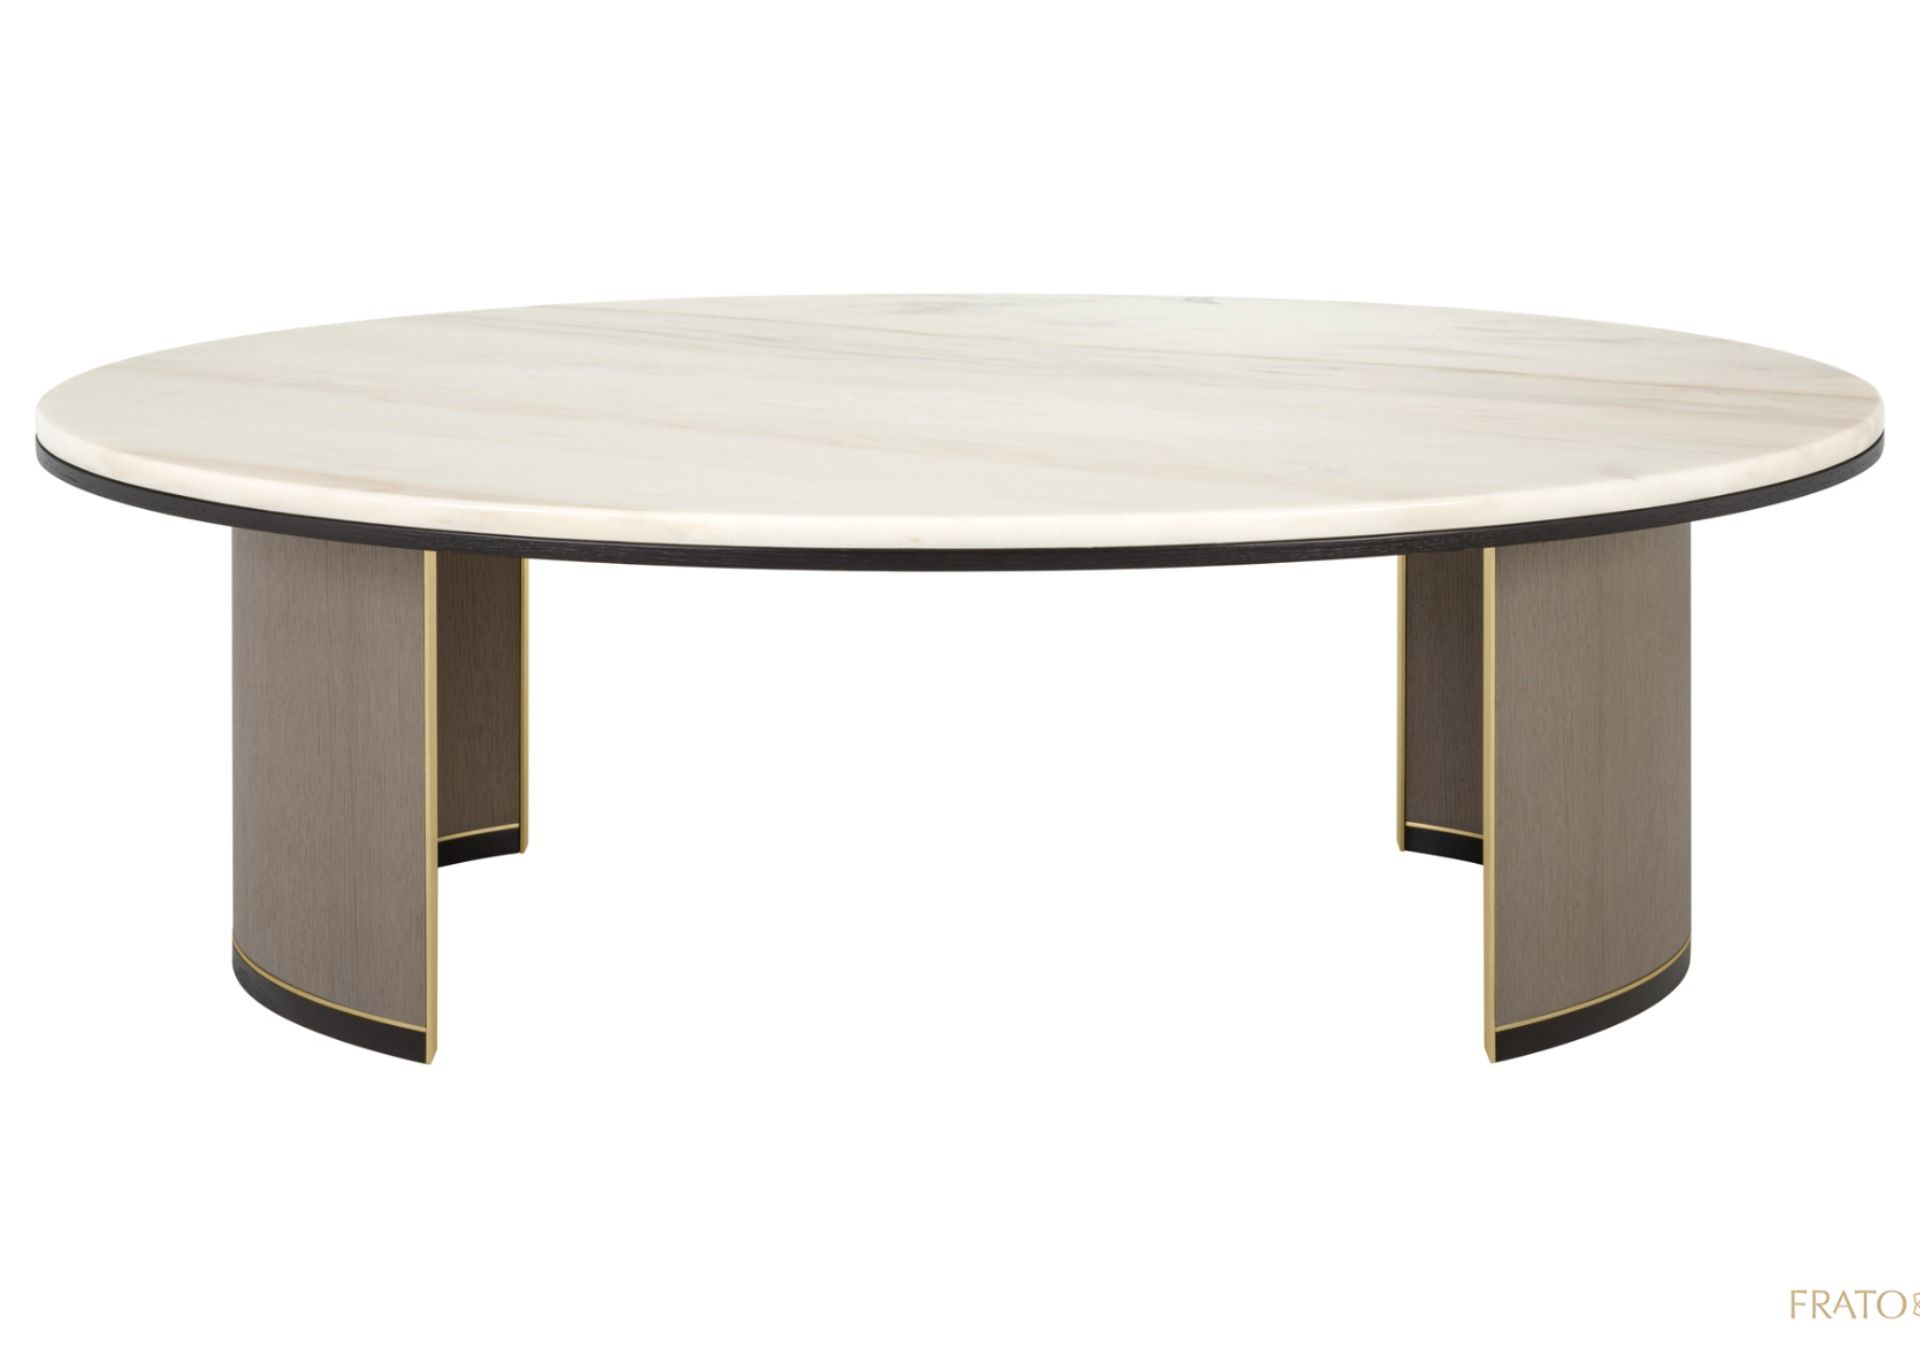 Frato Ceuta Coffee Table Table Luxury Furniture Design Elegant Furniture [ 1358 x 1920 Pixel ]